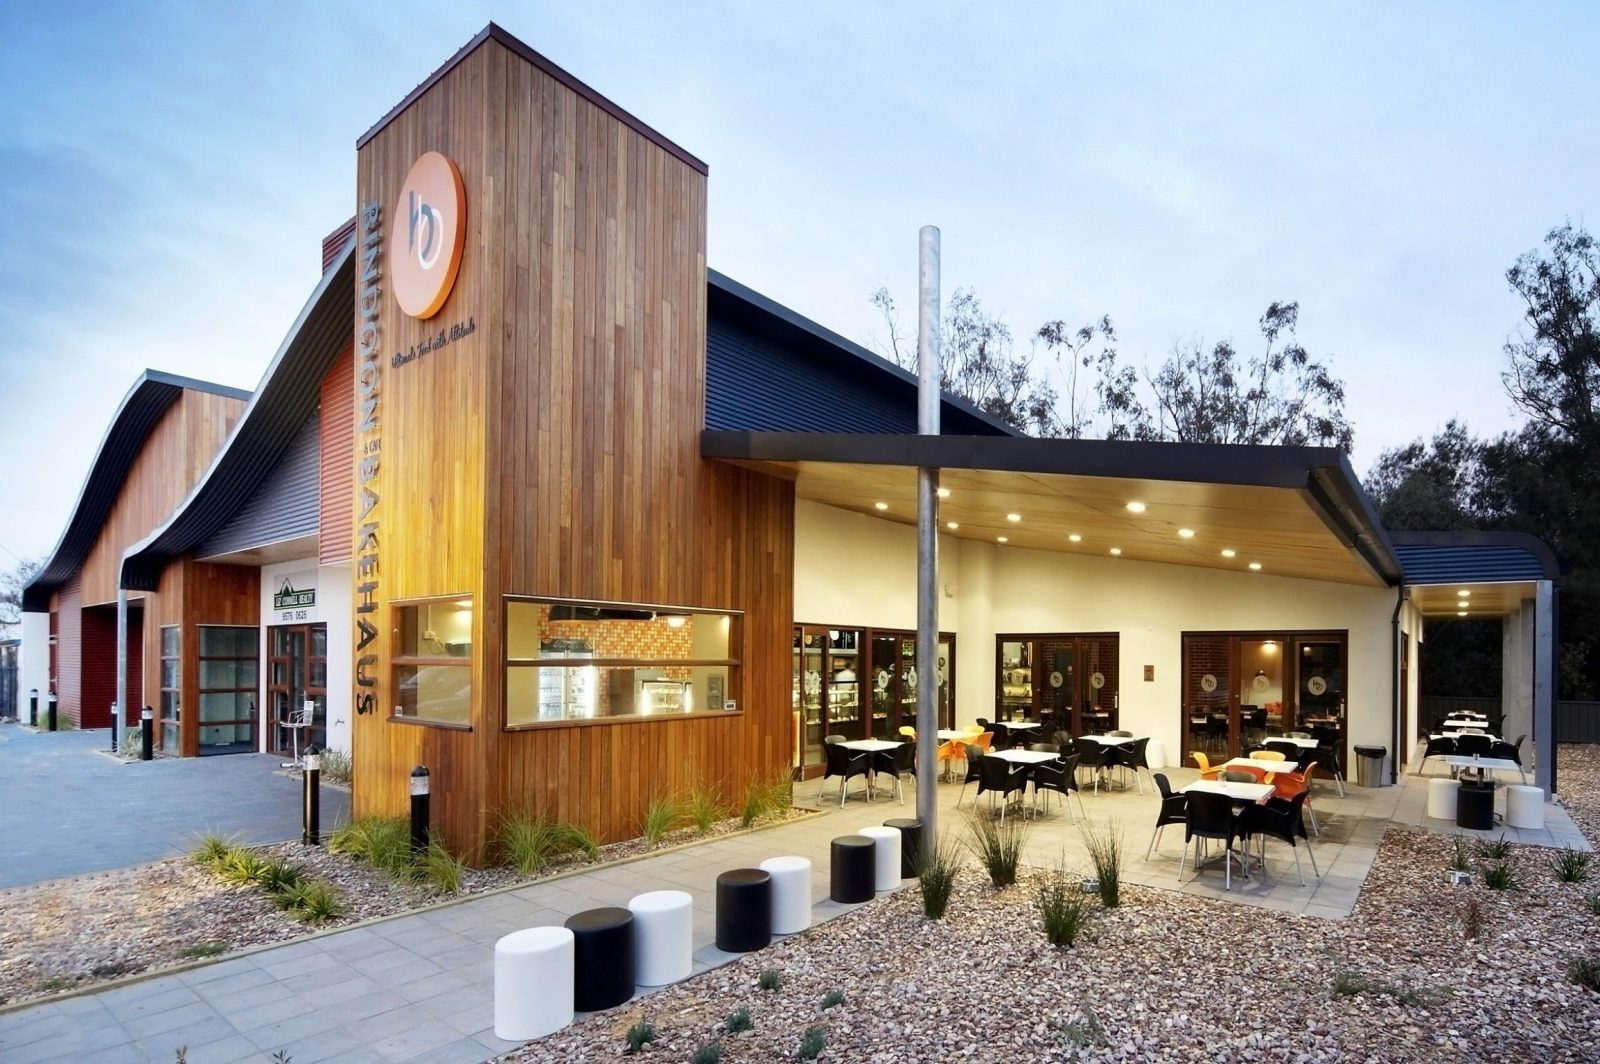 Bindoon Bakehaus and Cafe, Bindoon, Western Australia